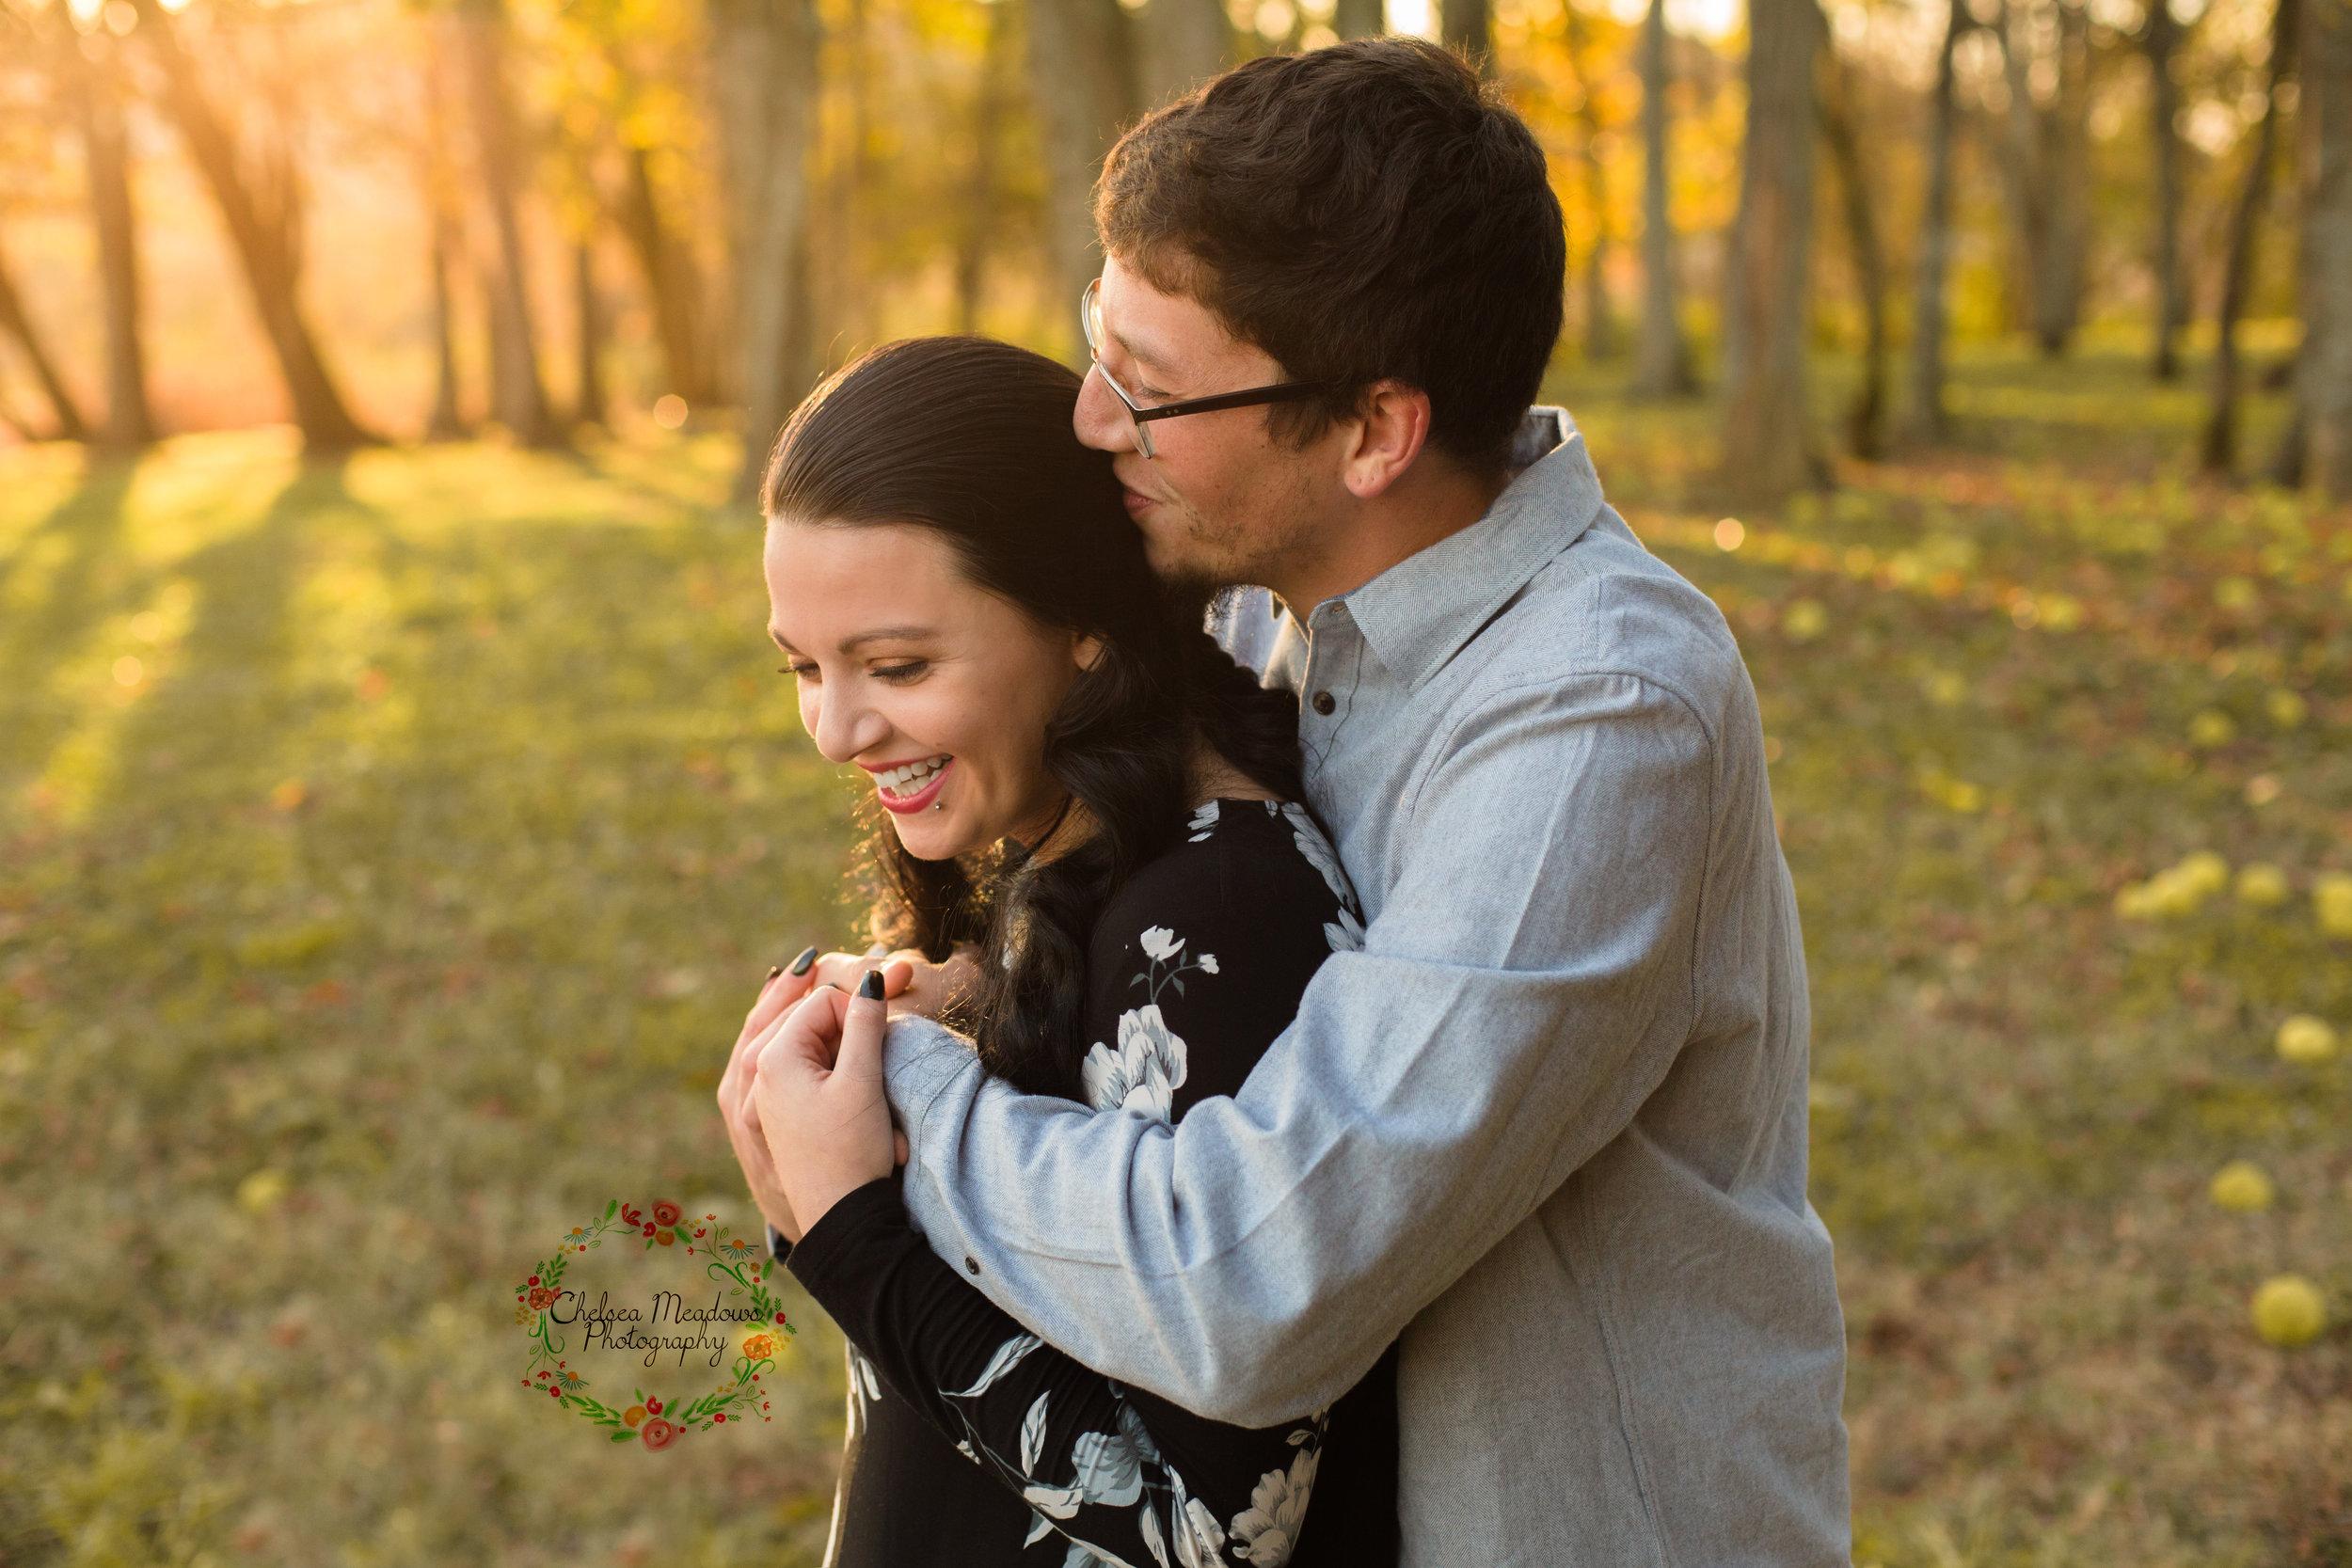 Jessica & Derek Engagement - Nashville Wedding Photographer - Chelsea Meadows Photography (34).jpg